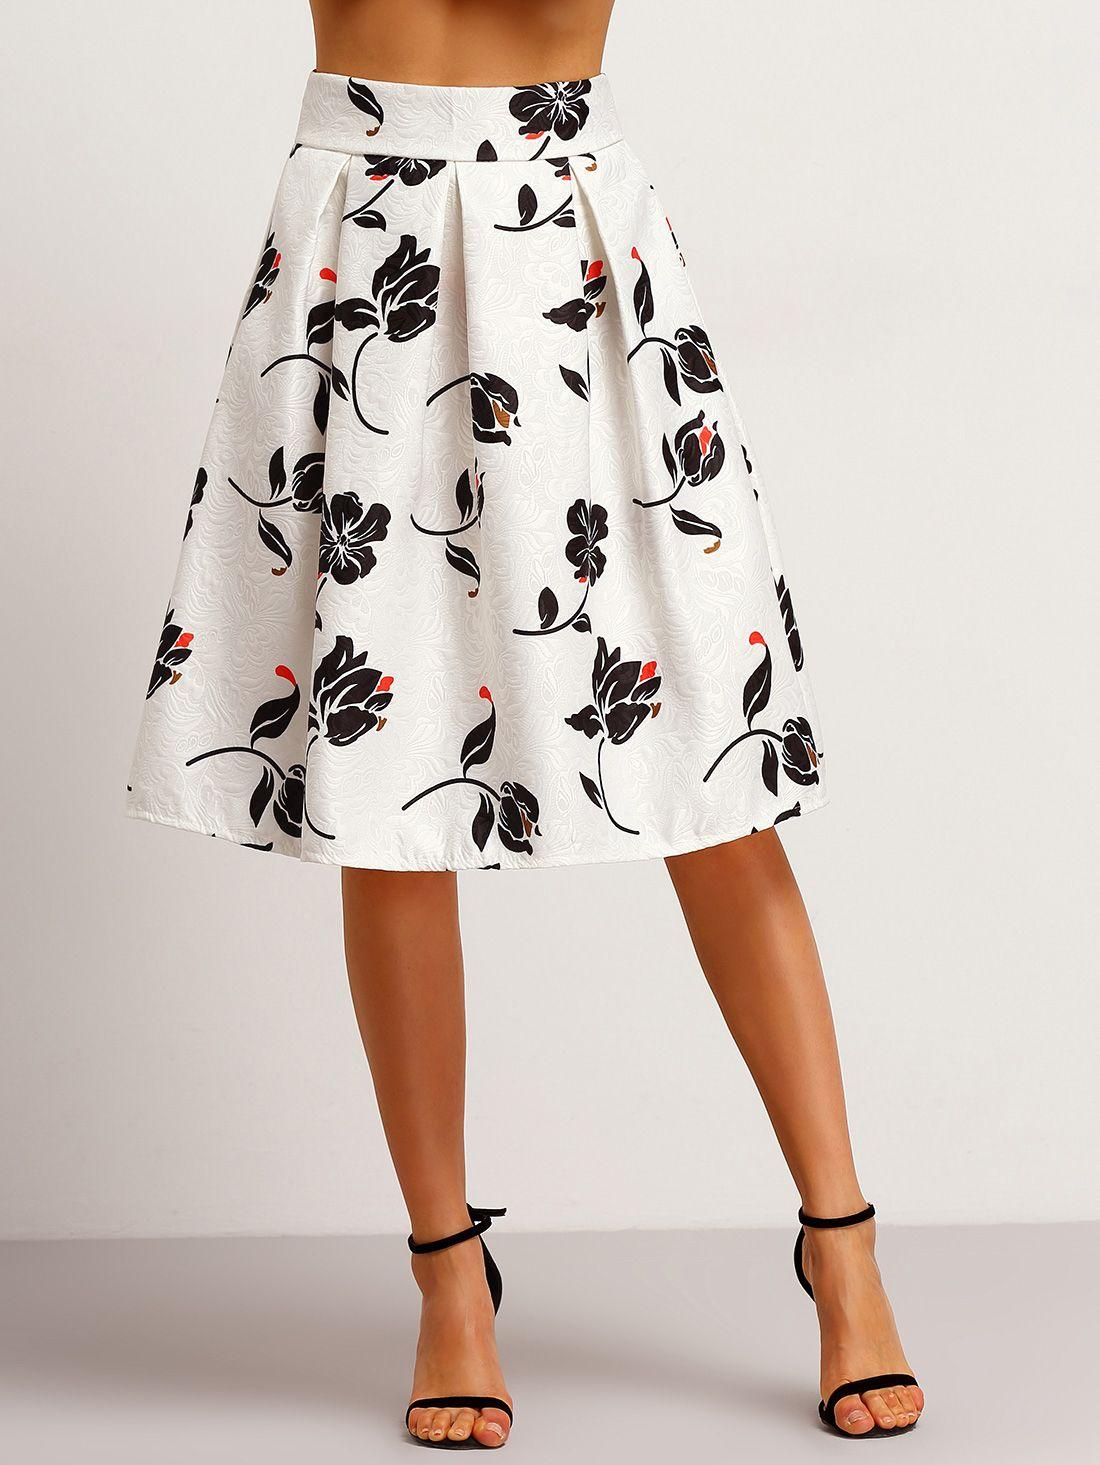 Falda flores jacquard con vuelo (Sheinside) | Faldas, Faldas